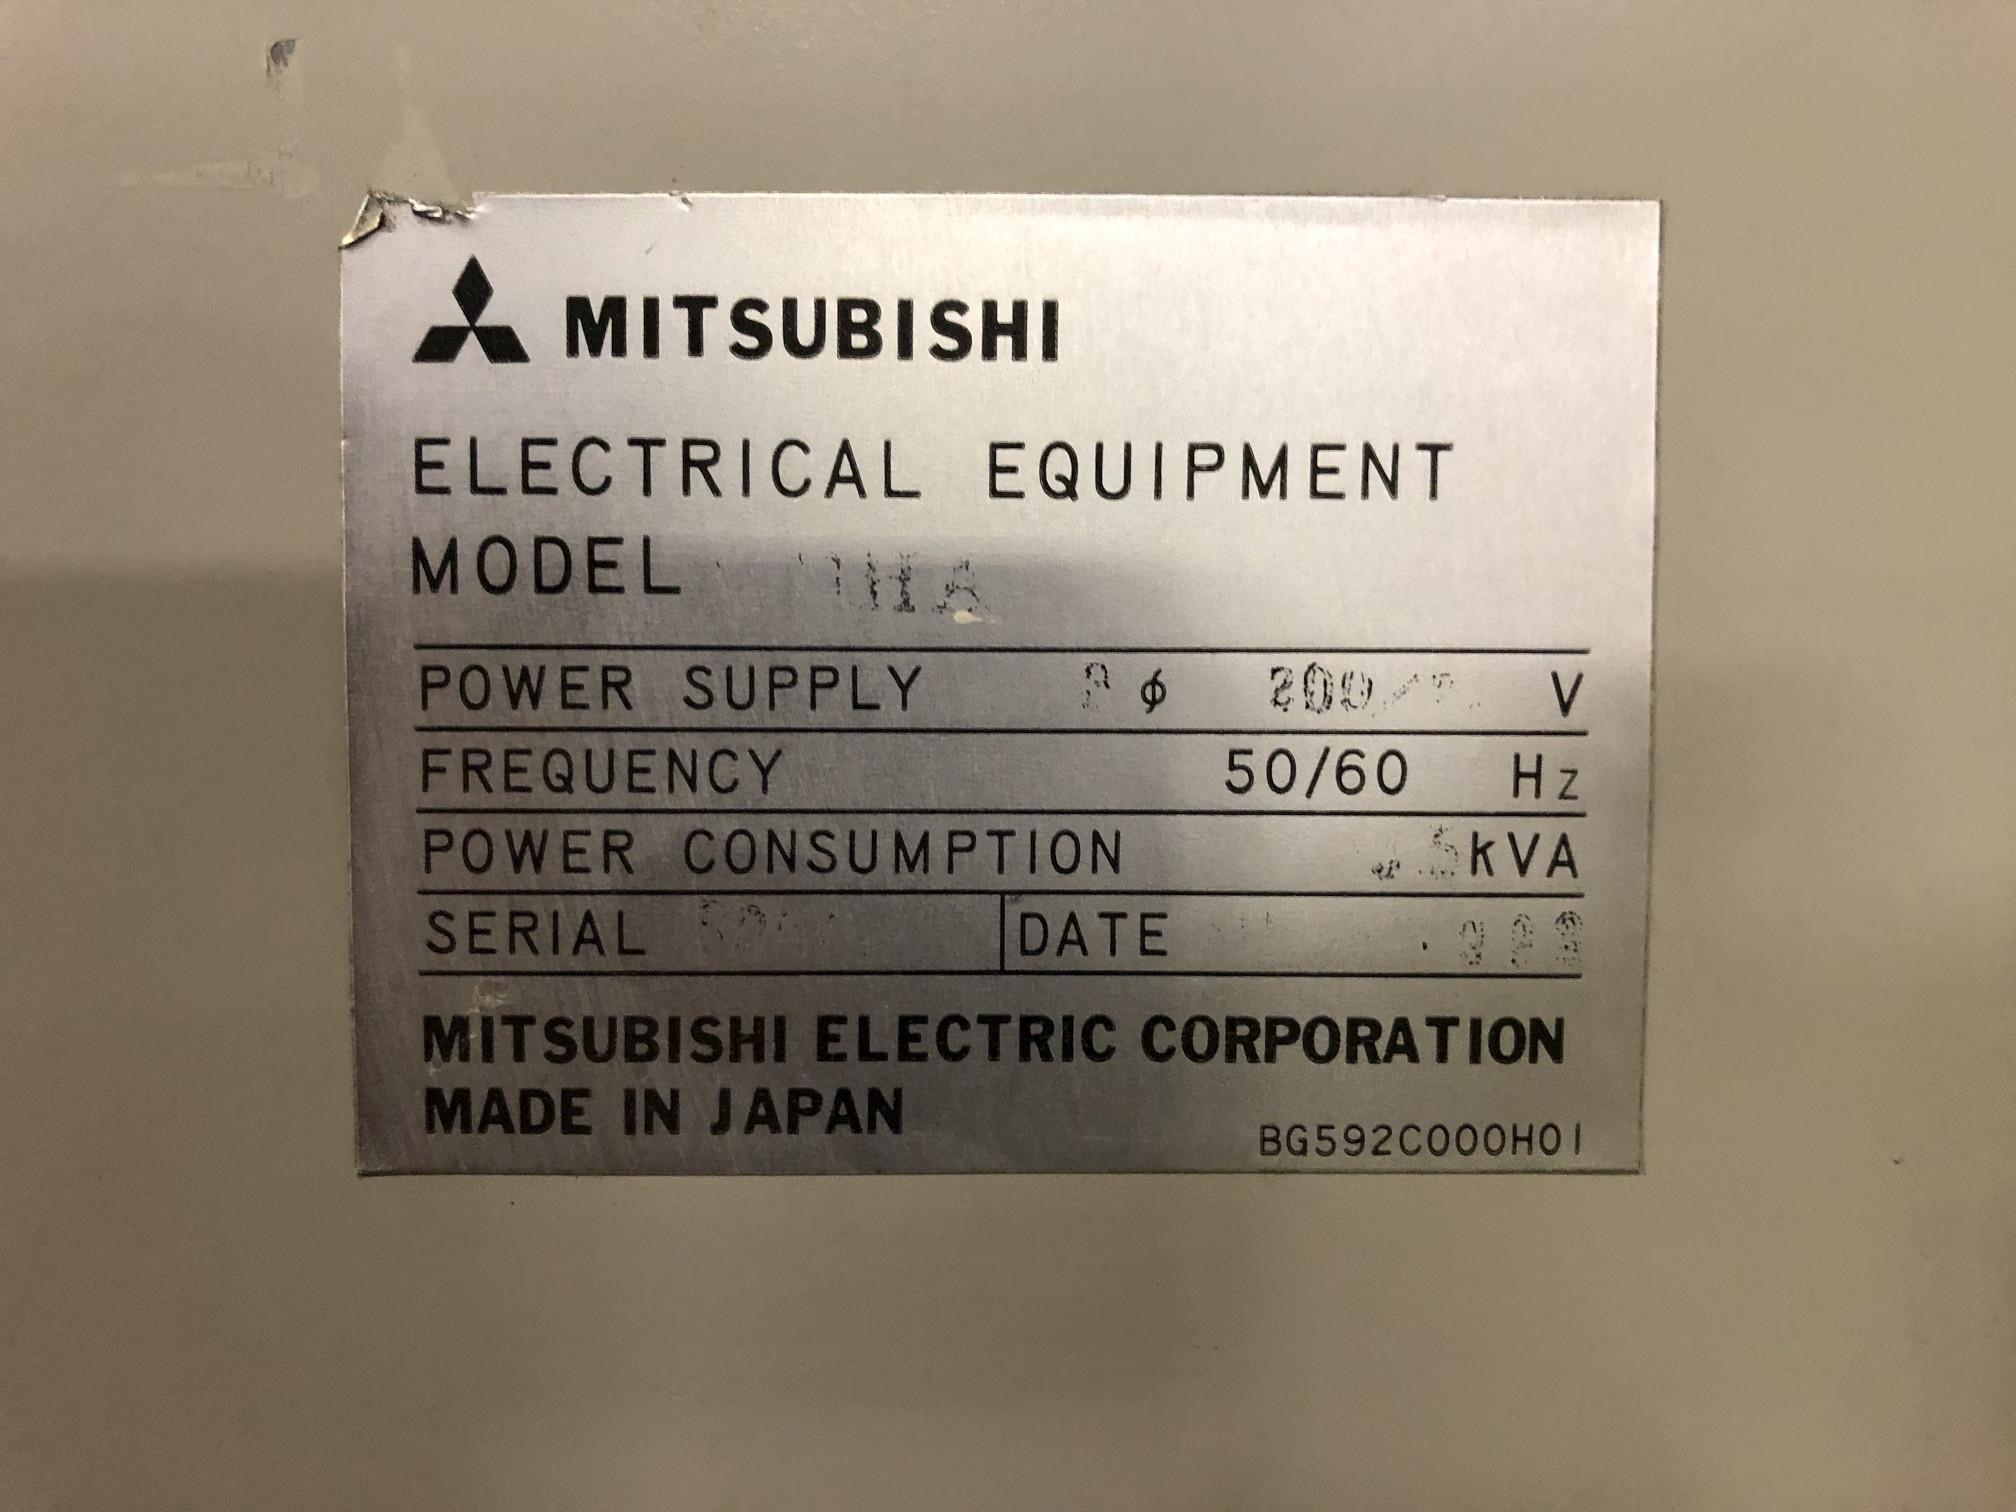 1993 Mitsubishi DWC90HA CNC Wire EDM - Image 12 of 16